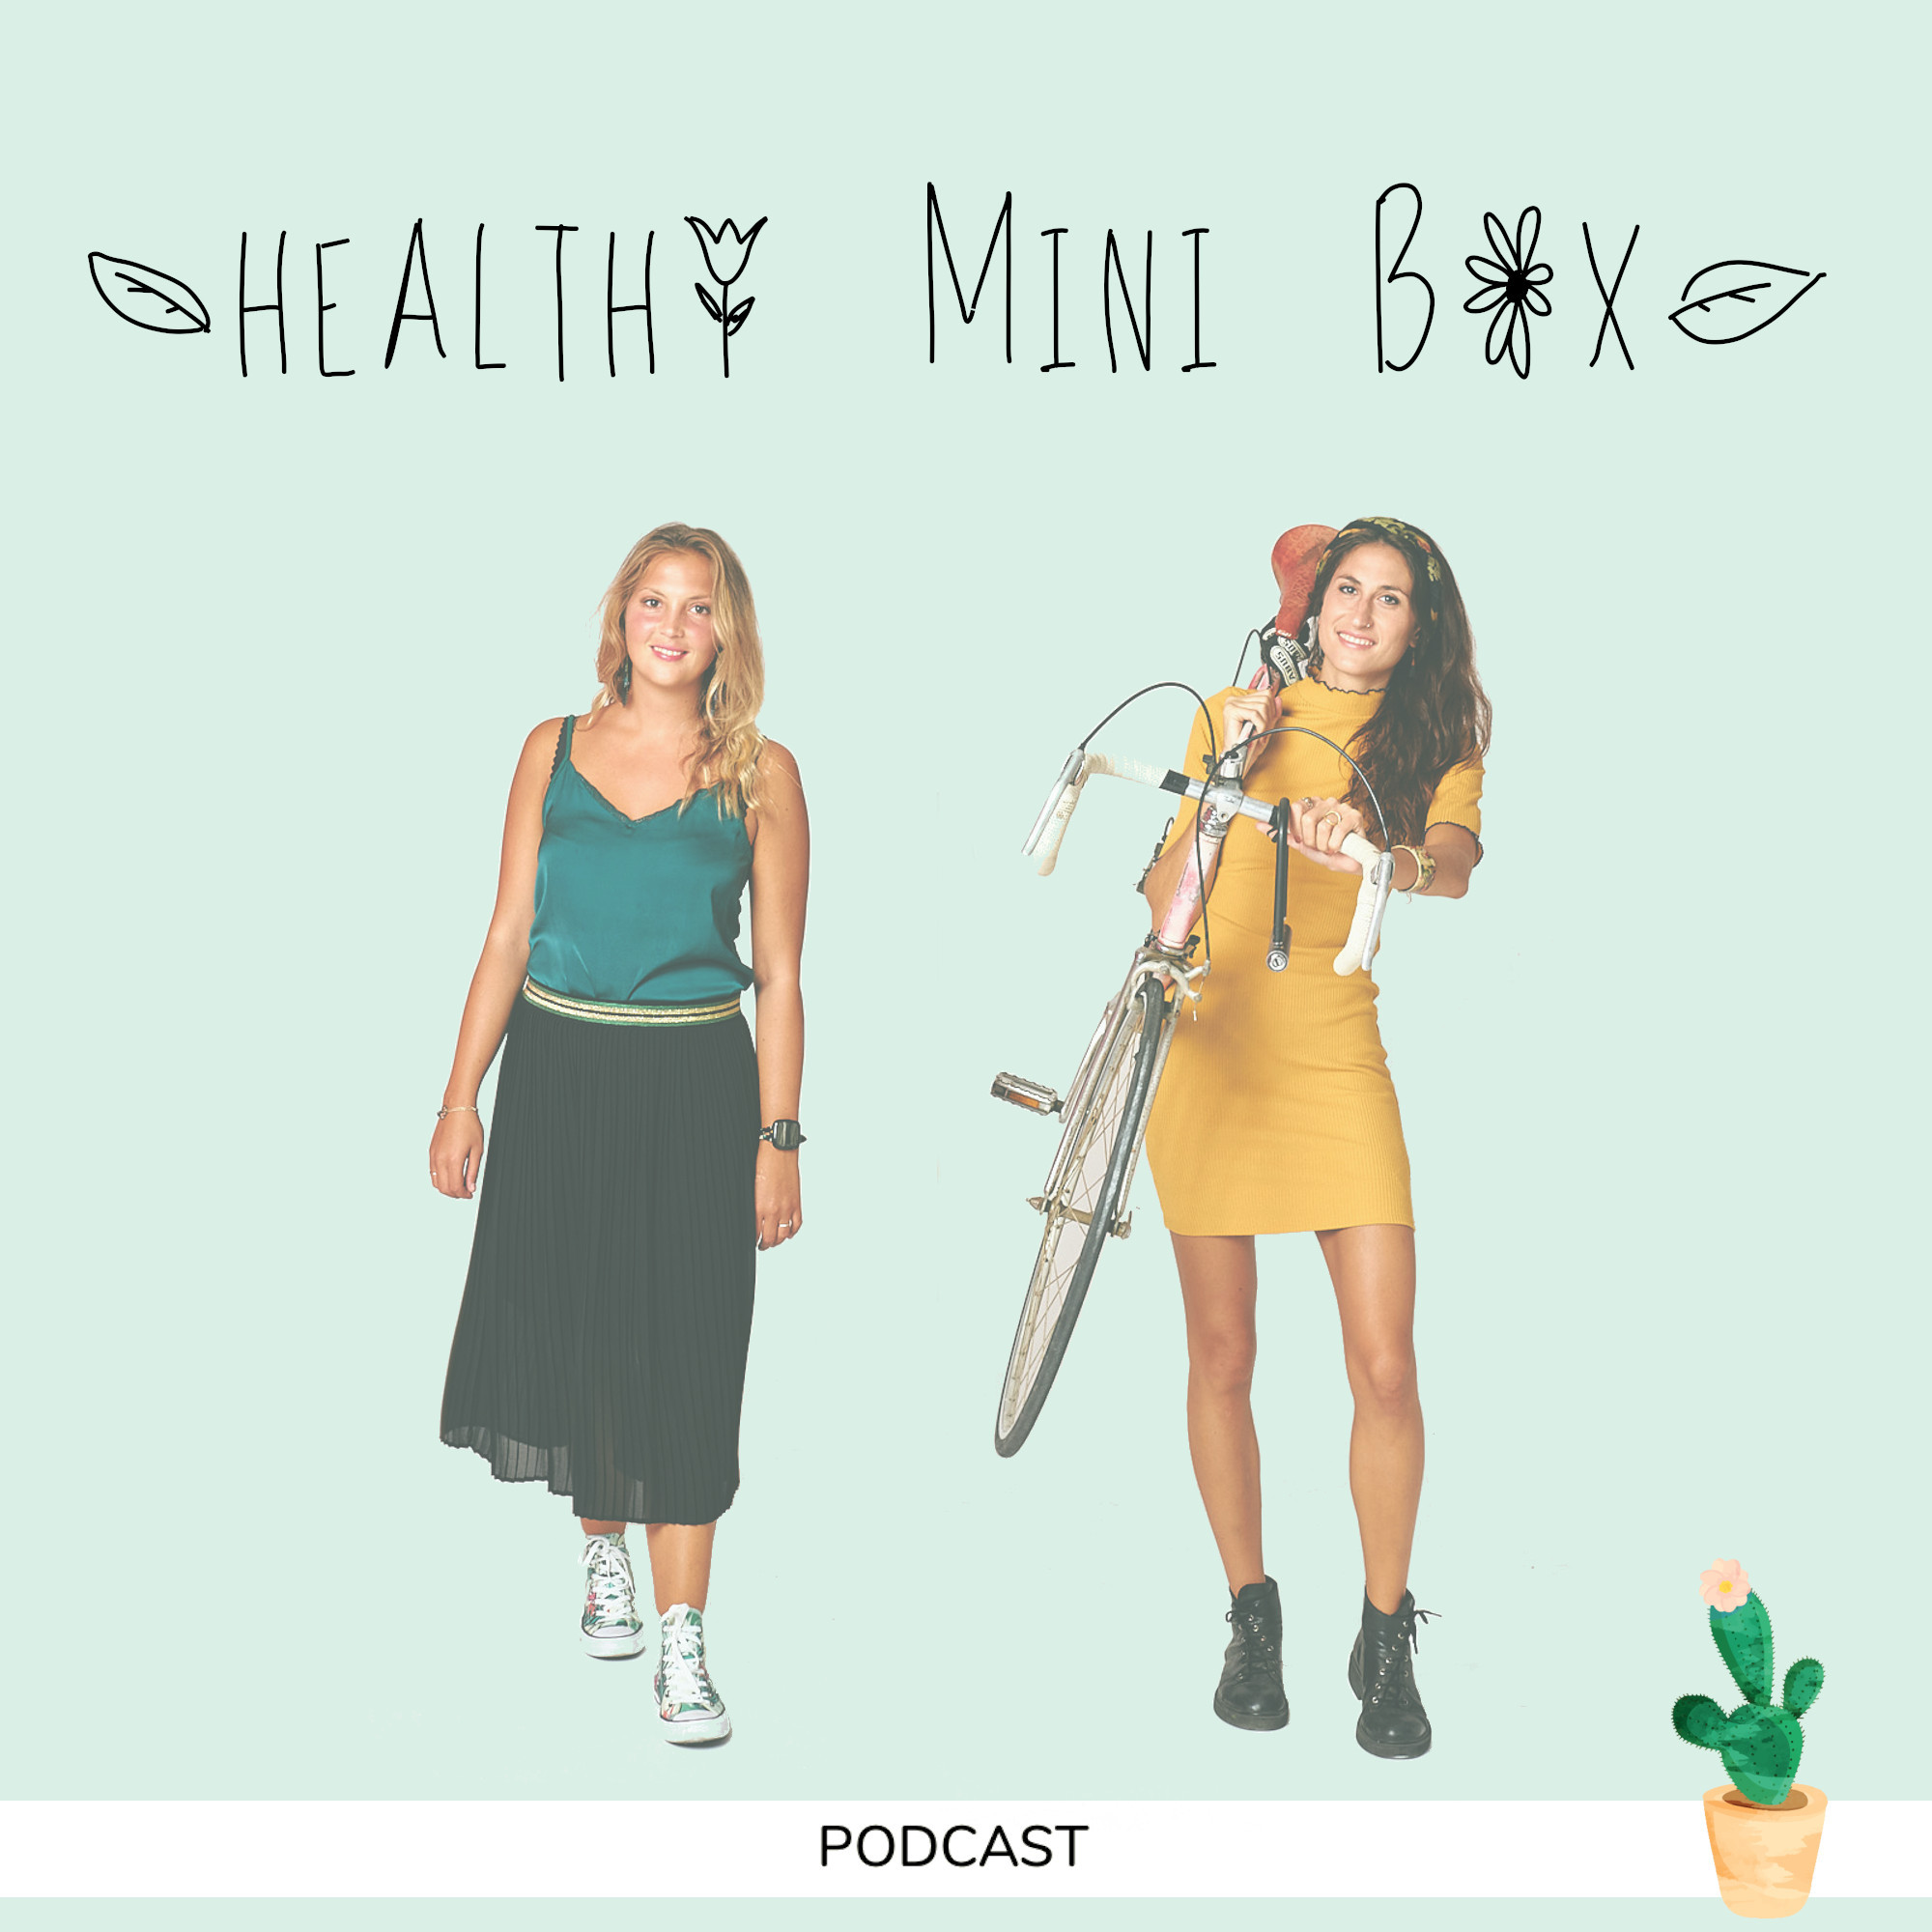 HEALTHY MINI BOX PODCAST